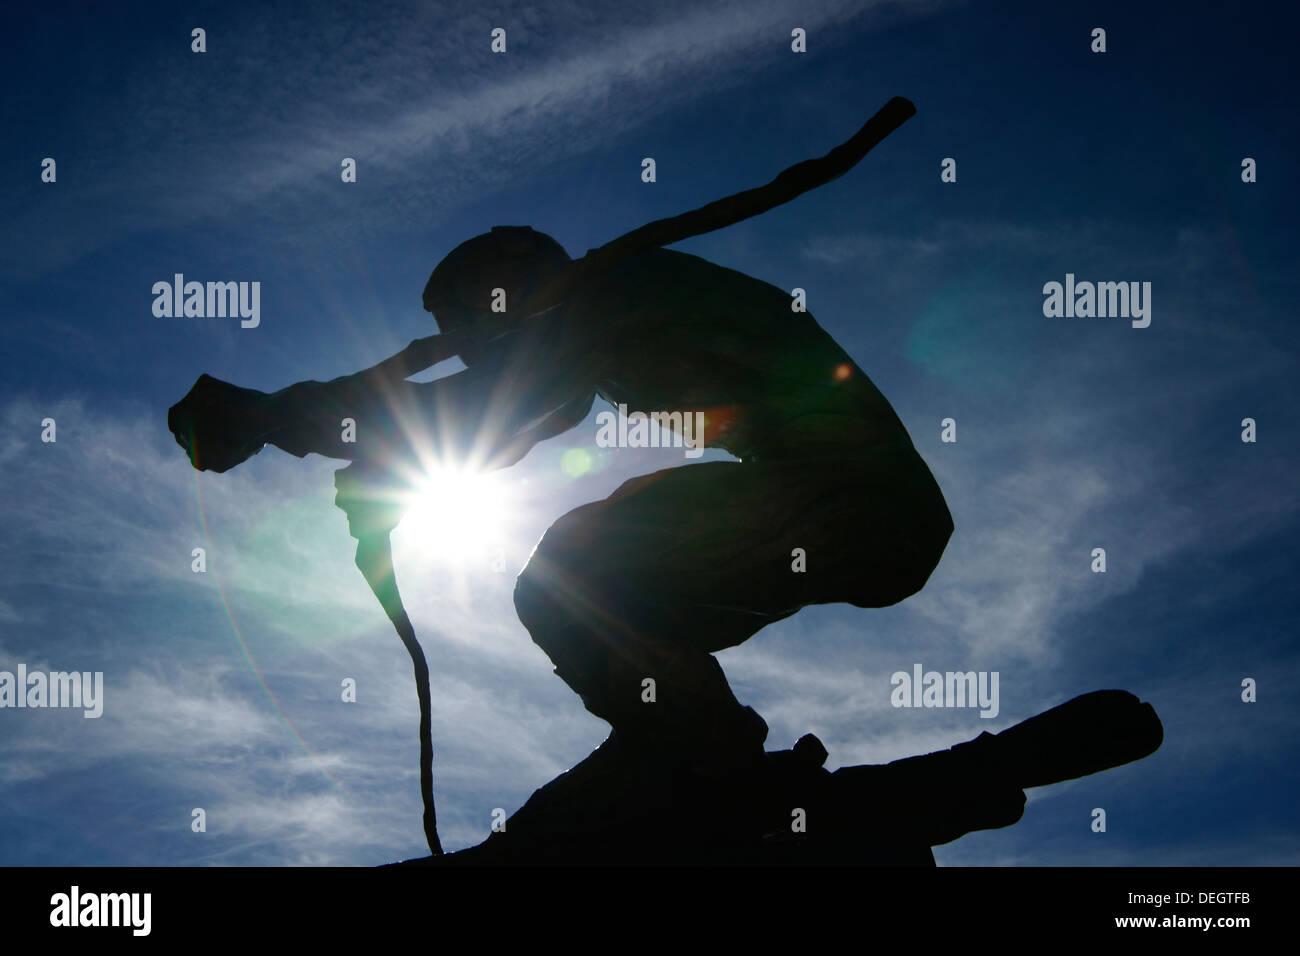 close-up of statue 'The Edge' with sunburst (Vail, Colorado, USA) - Stock Image